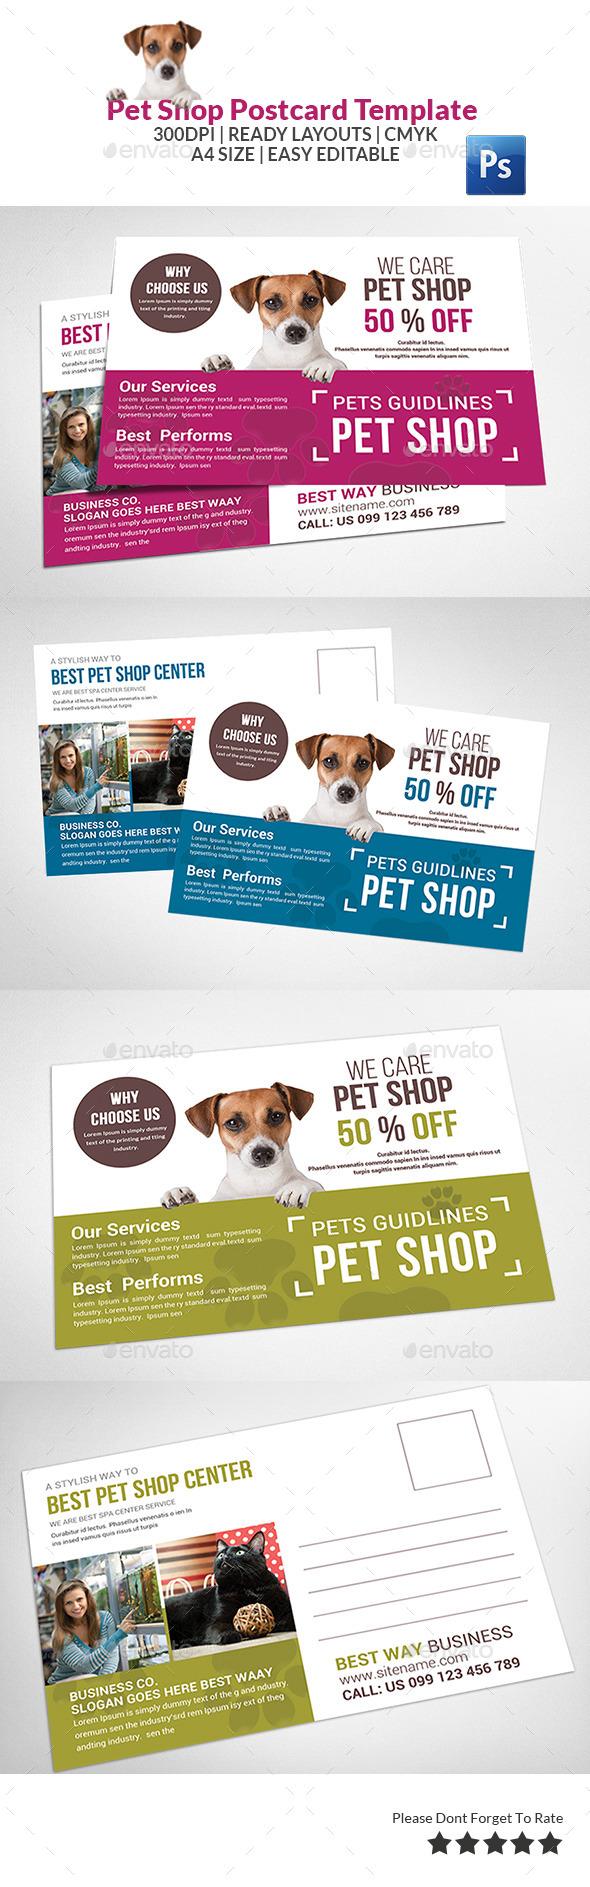 Pet Shop Postcard Template  - Cards & Invites Print Templates